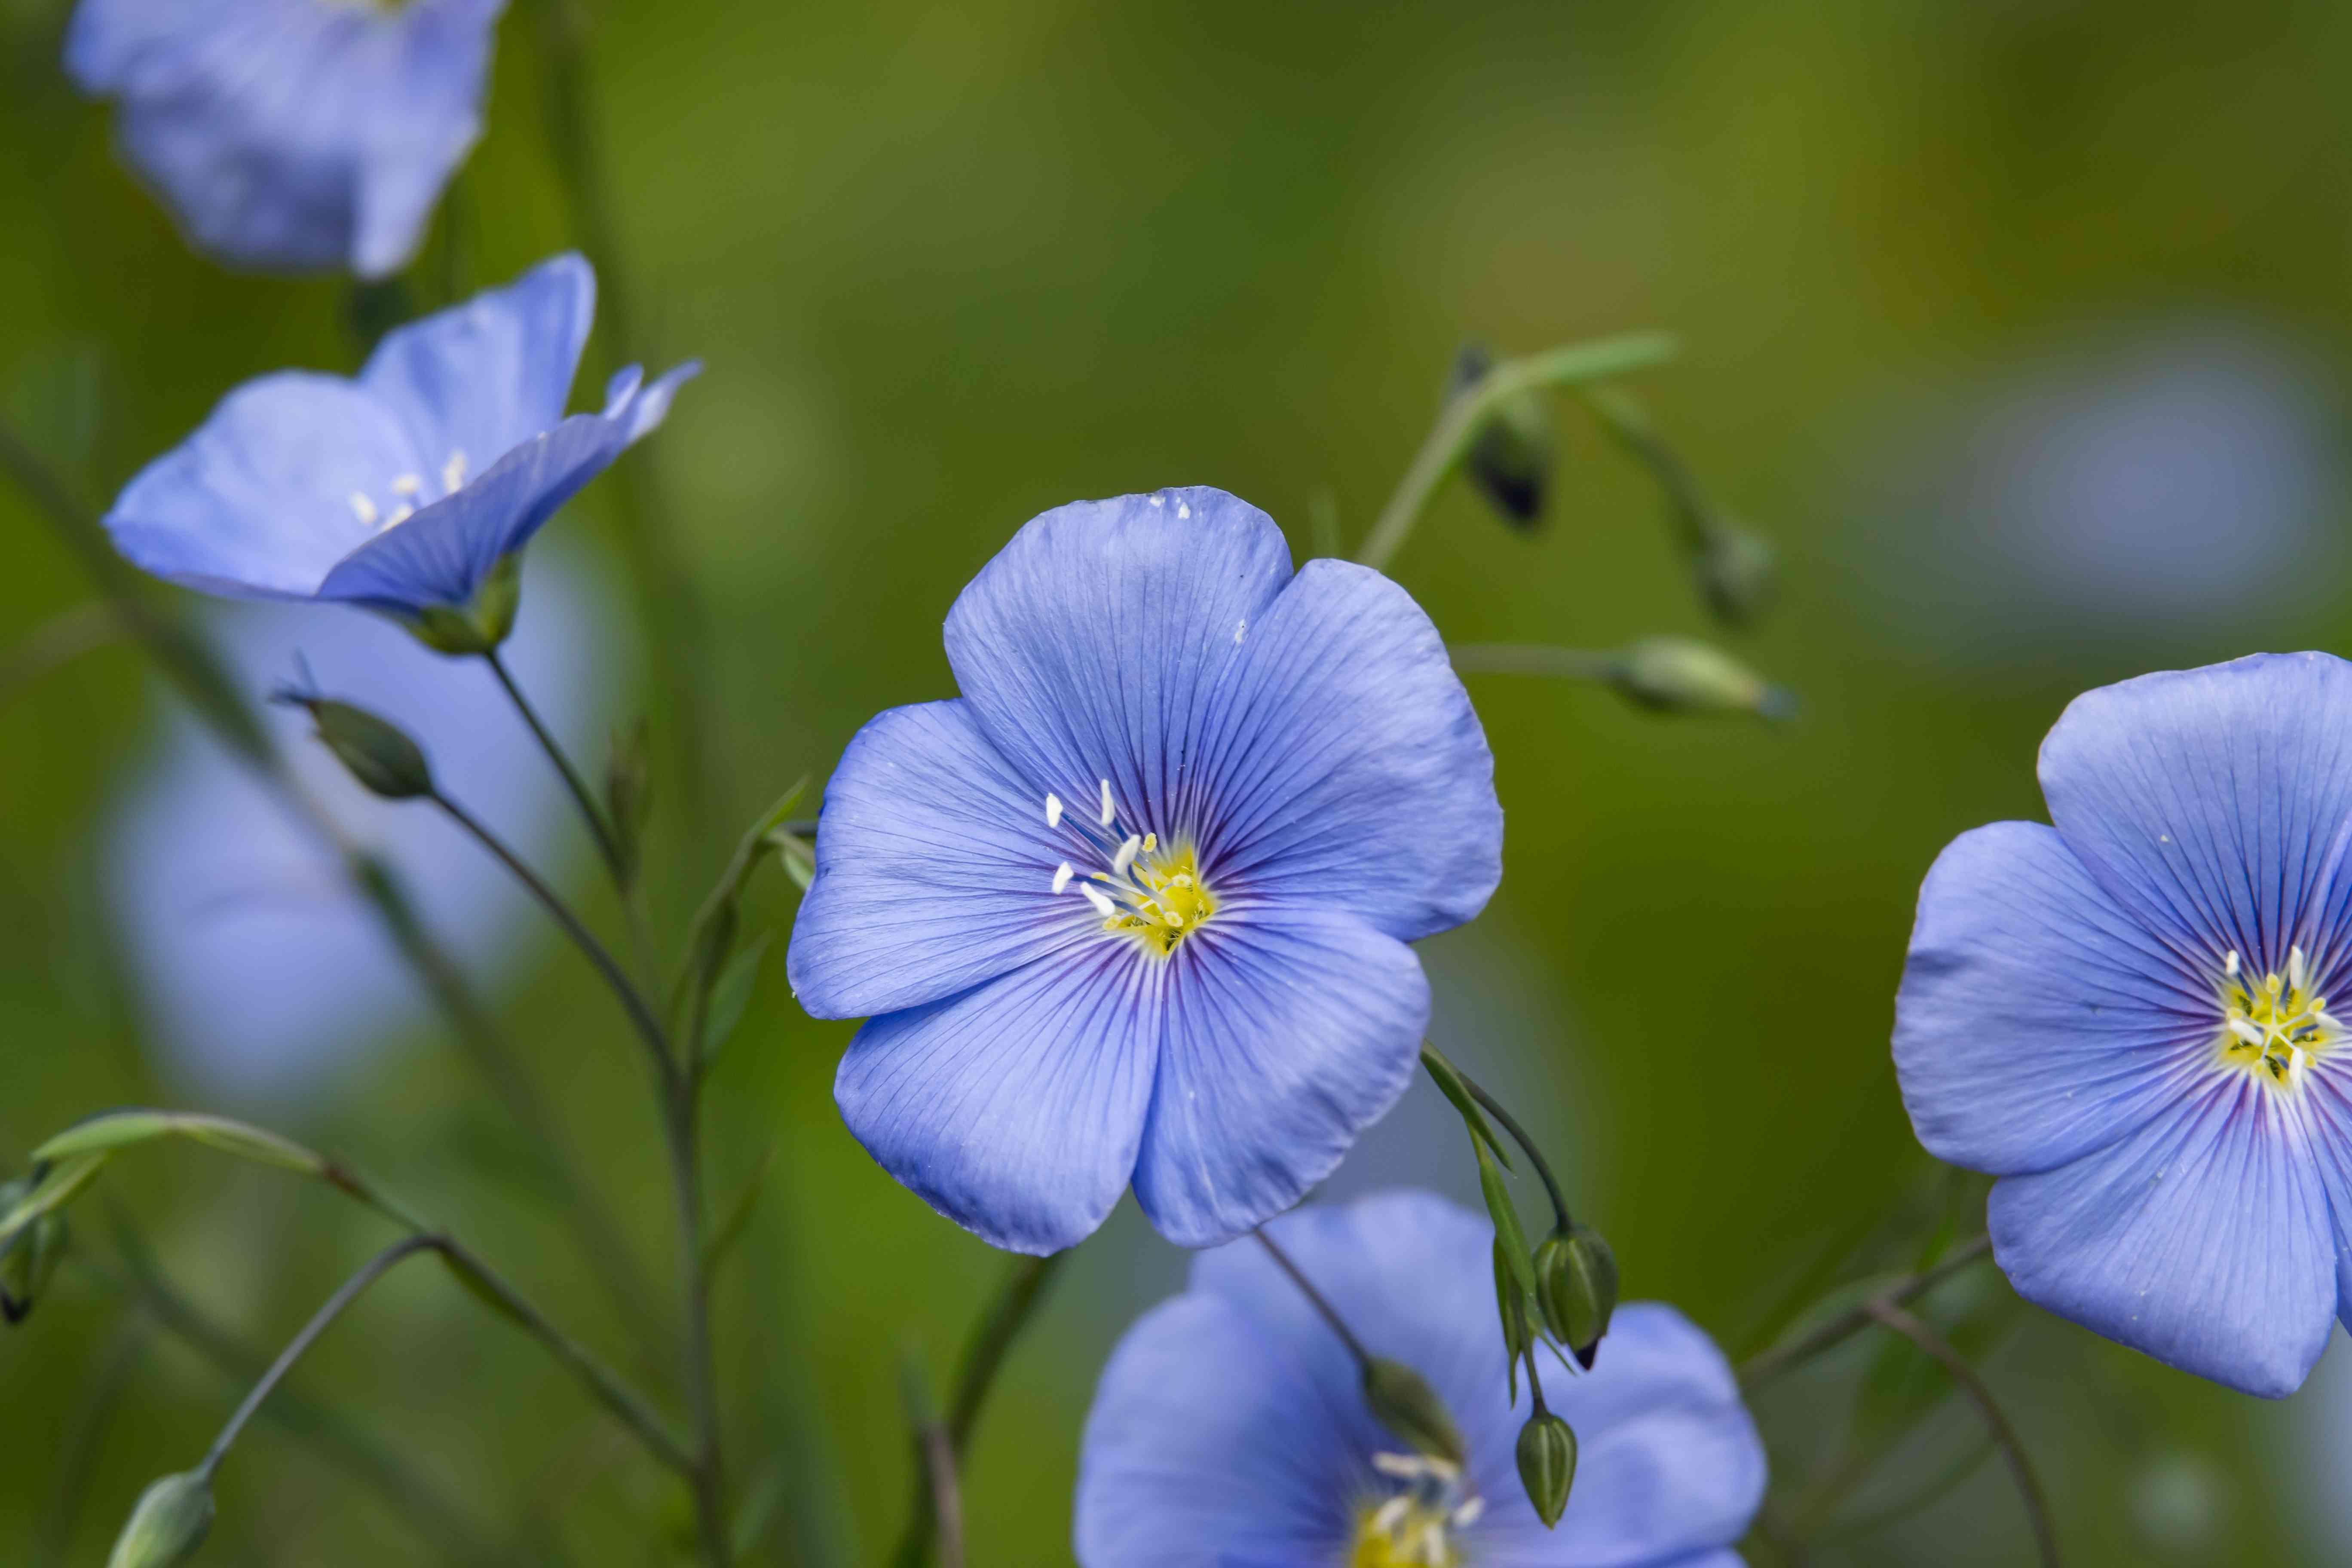 Blue Flax Flowers in Bloom in Springtime